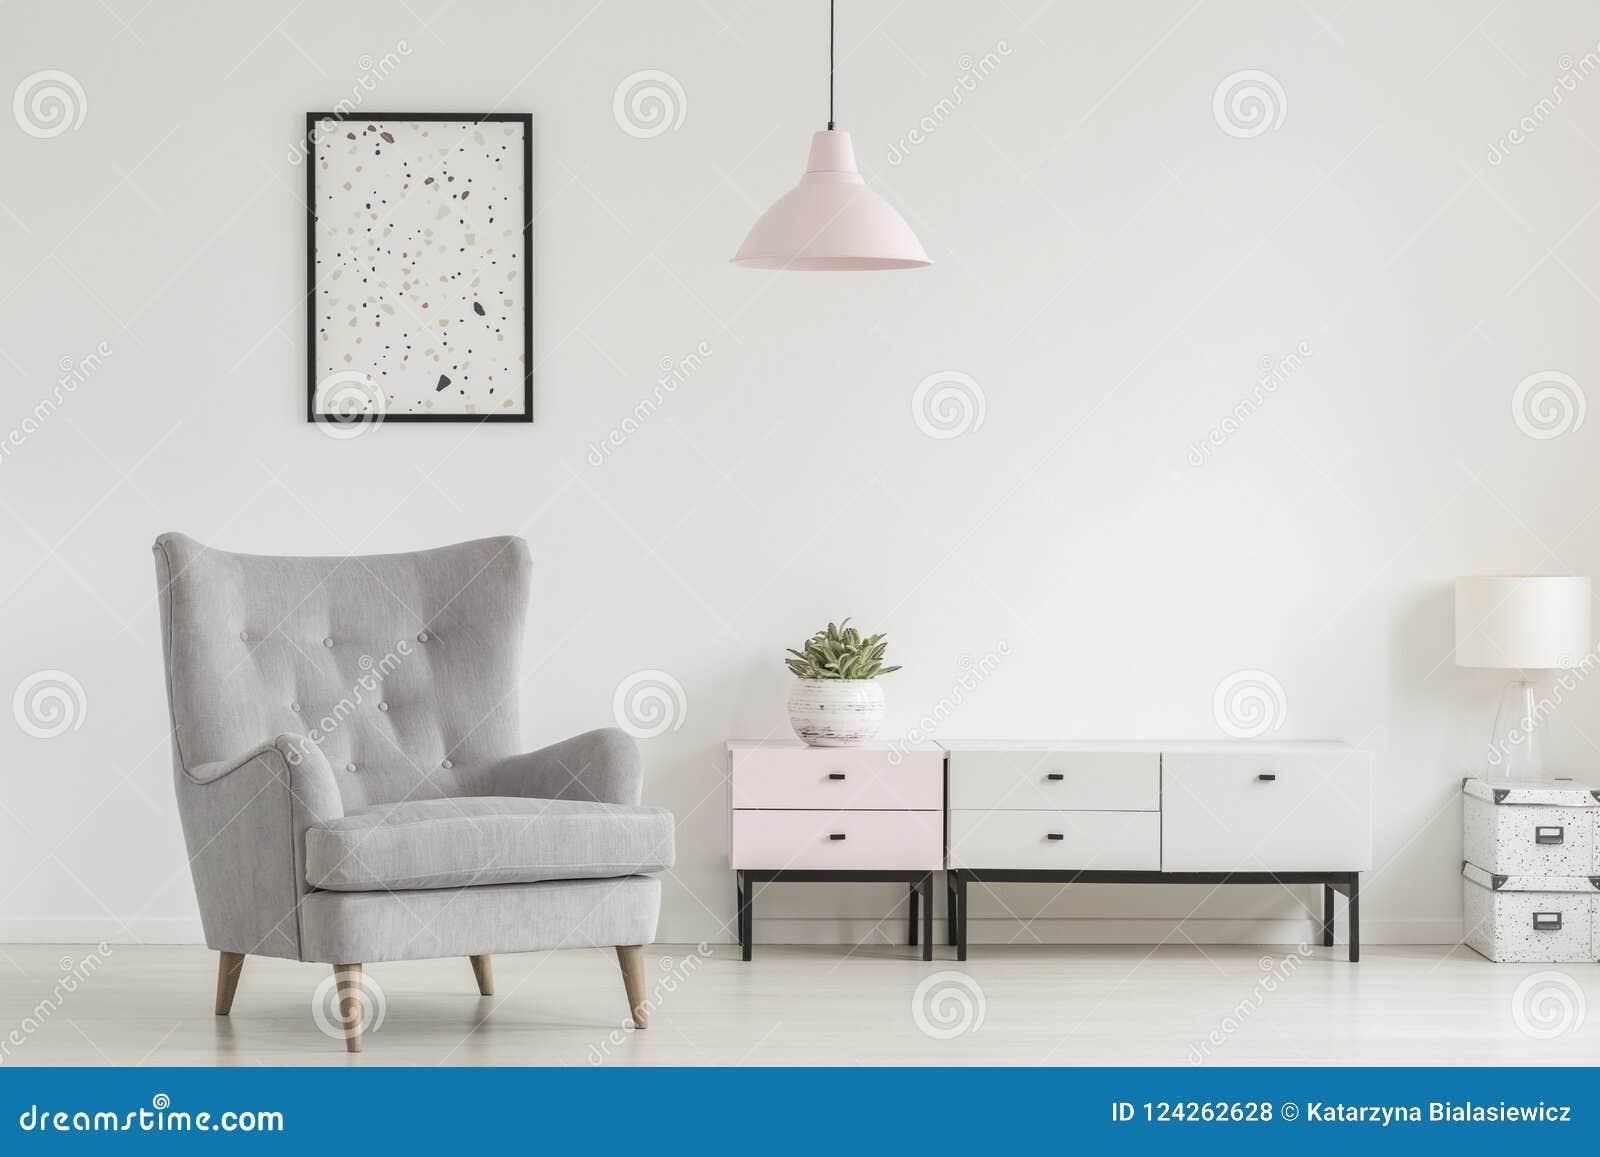 Cartaz acima da poltrona e da lâmpada cinzentas no interio branco da sala de visitas